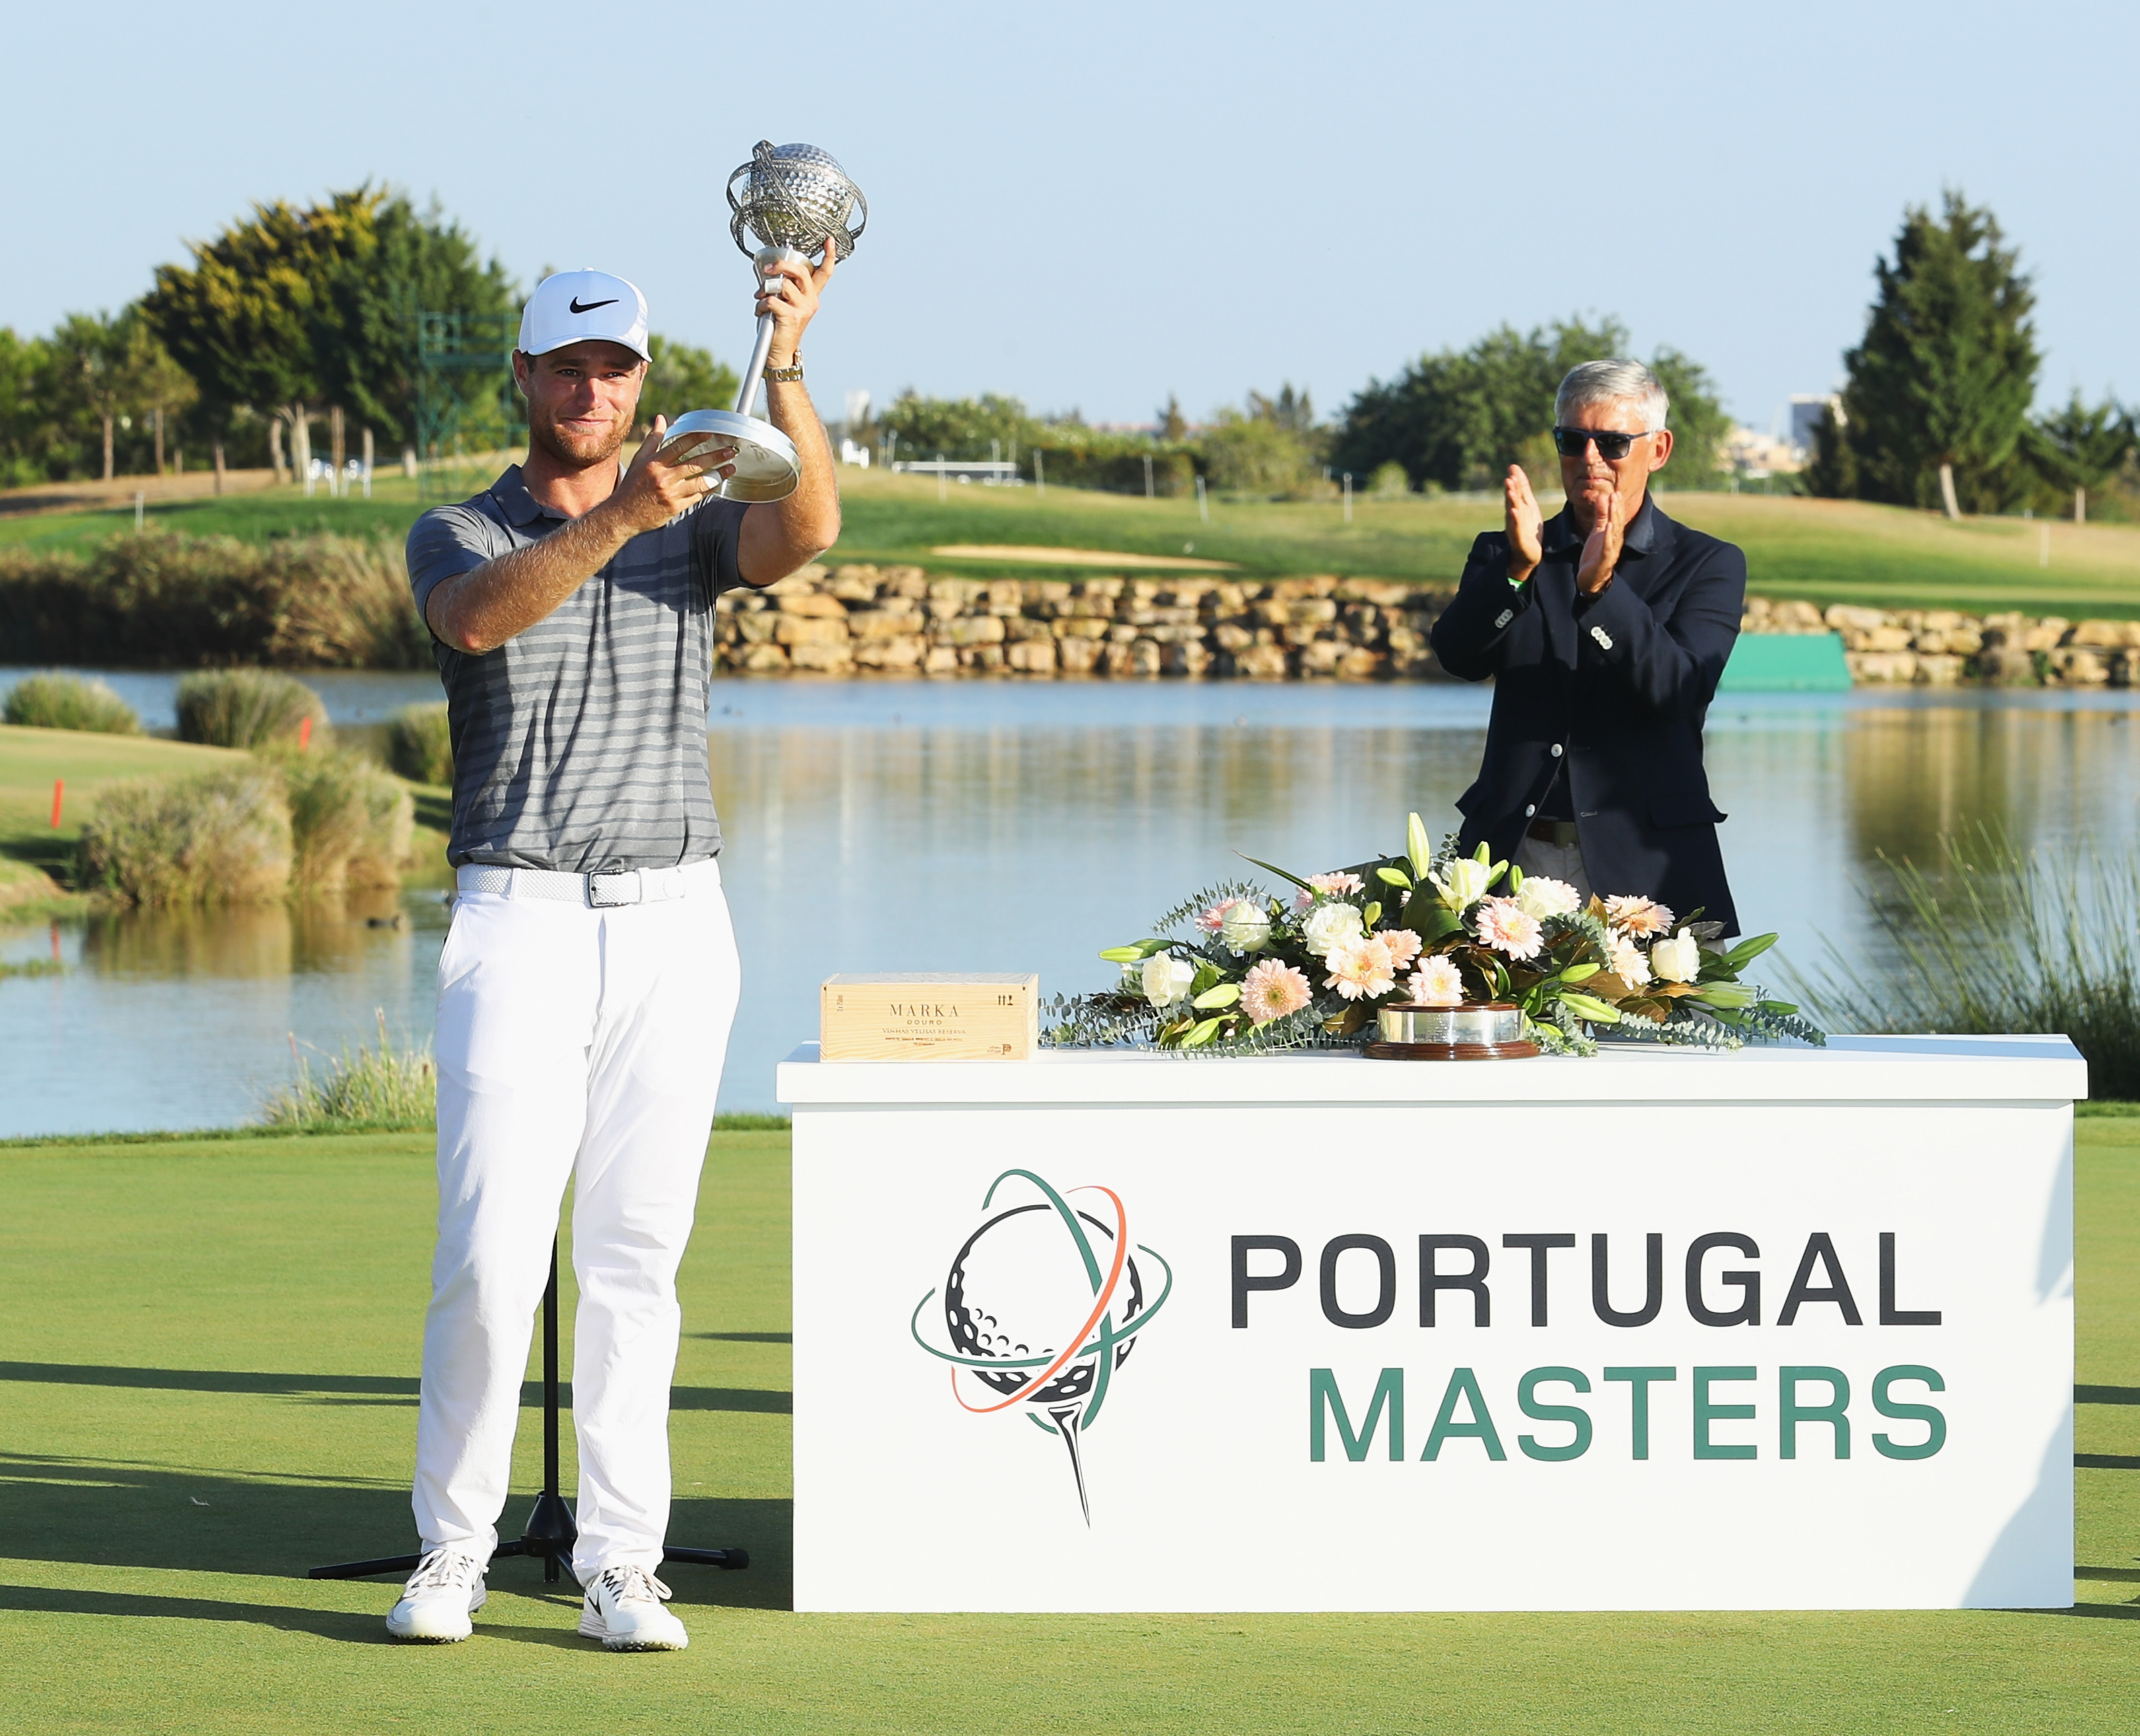 12º Portugal Masters – LUCAS BJERREGAARD EM VILAMOURA PARA DEFENDER O TÍTULO